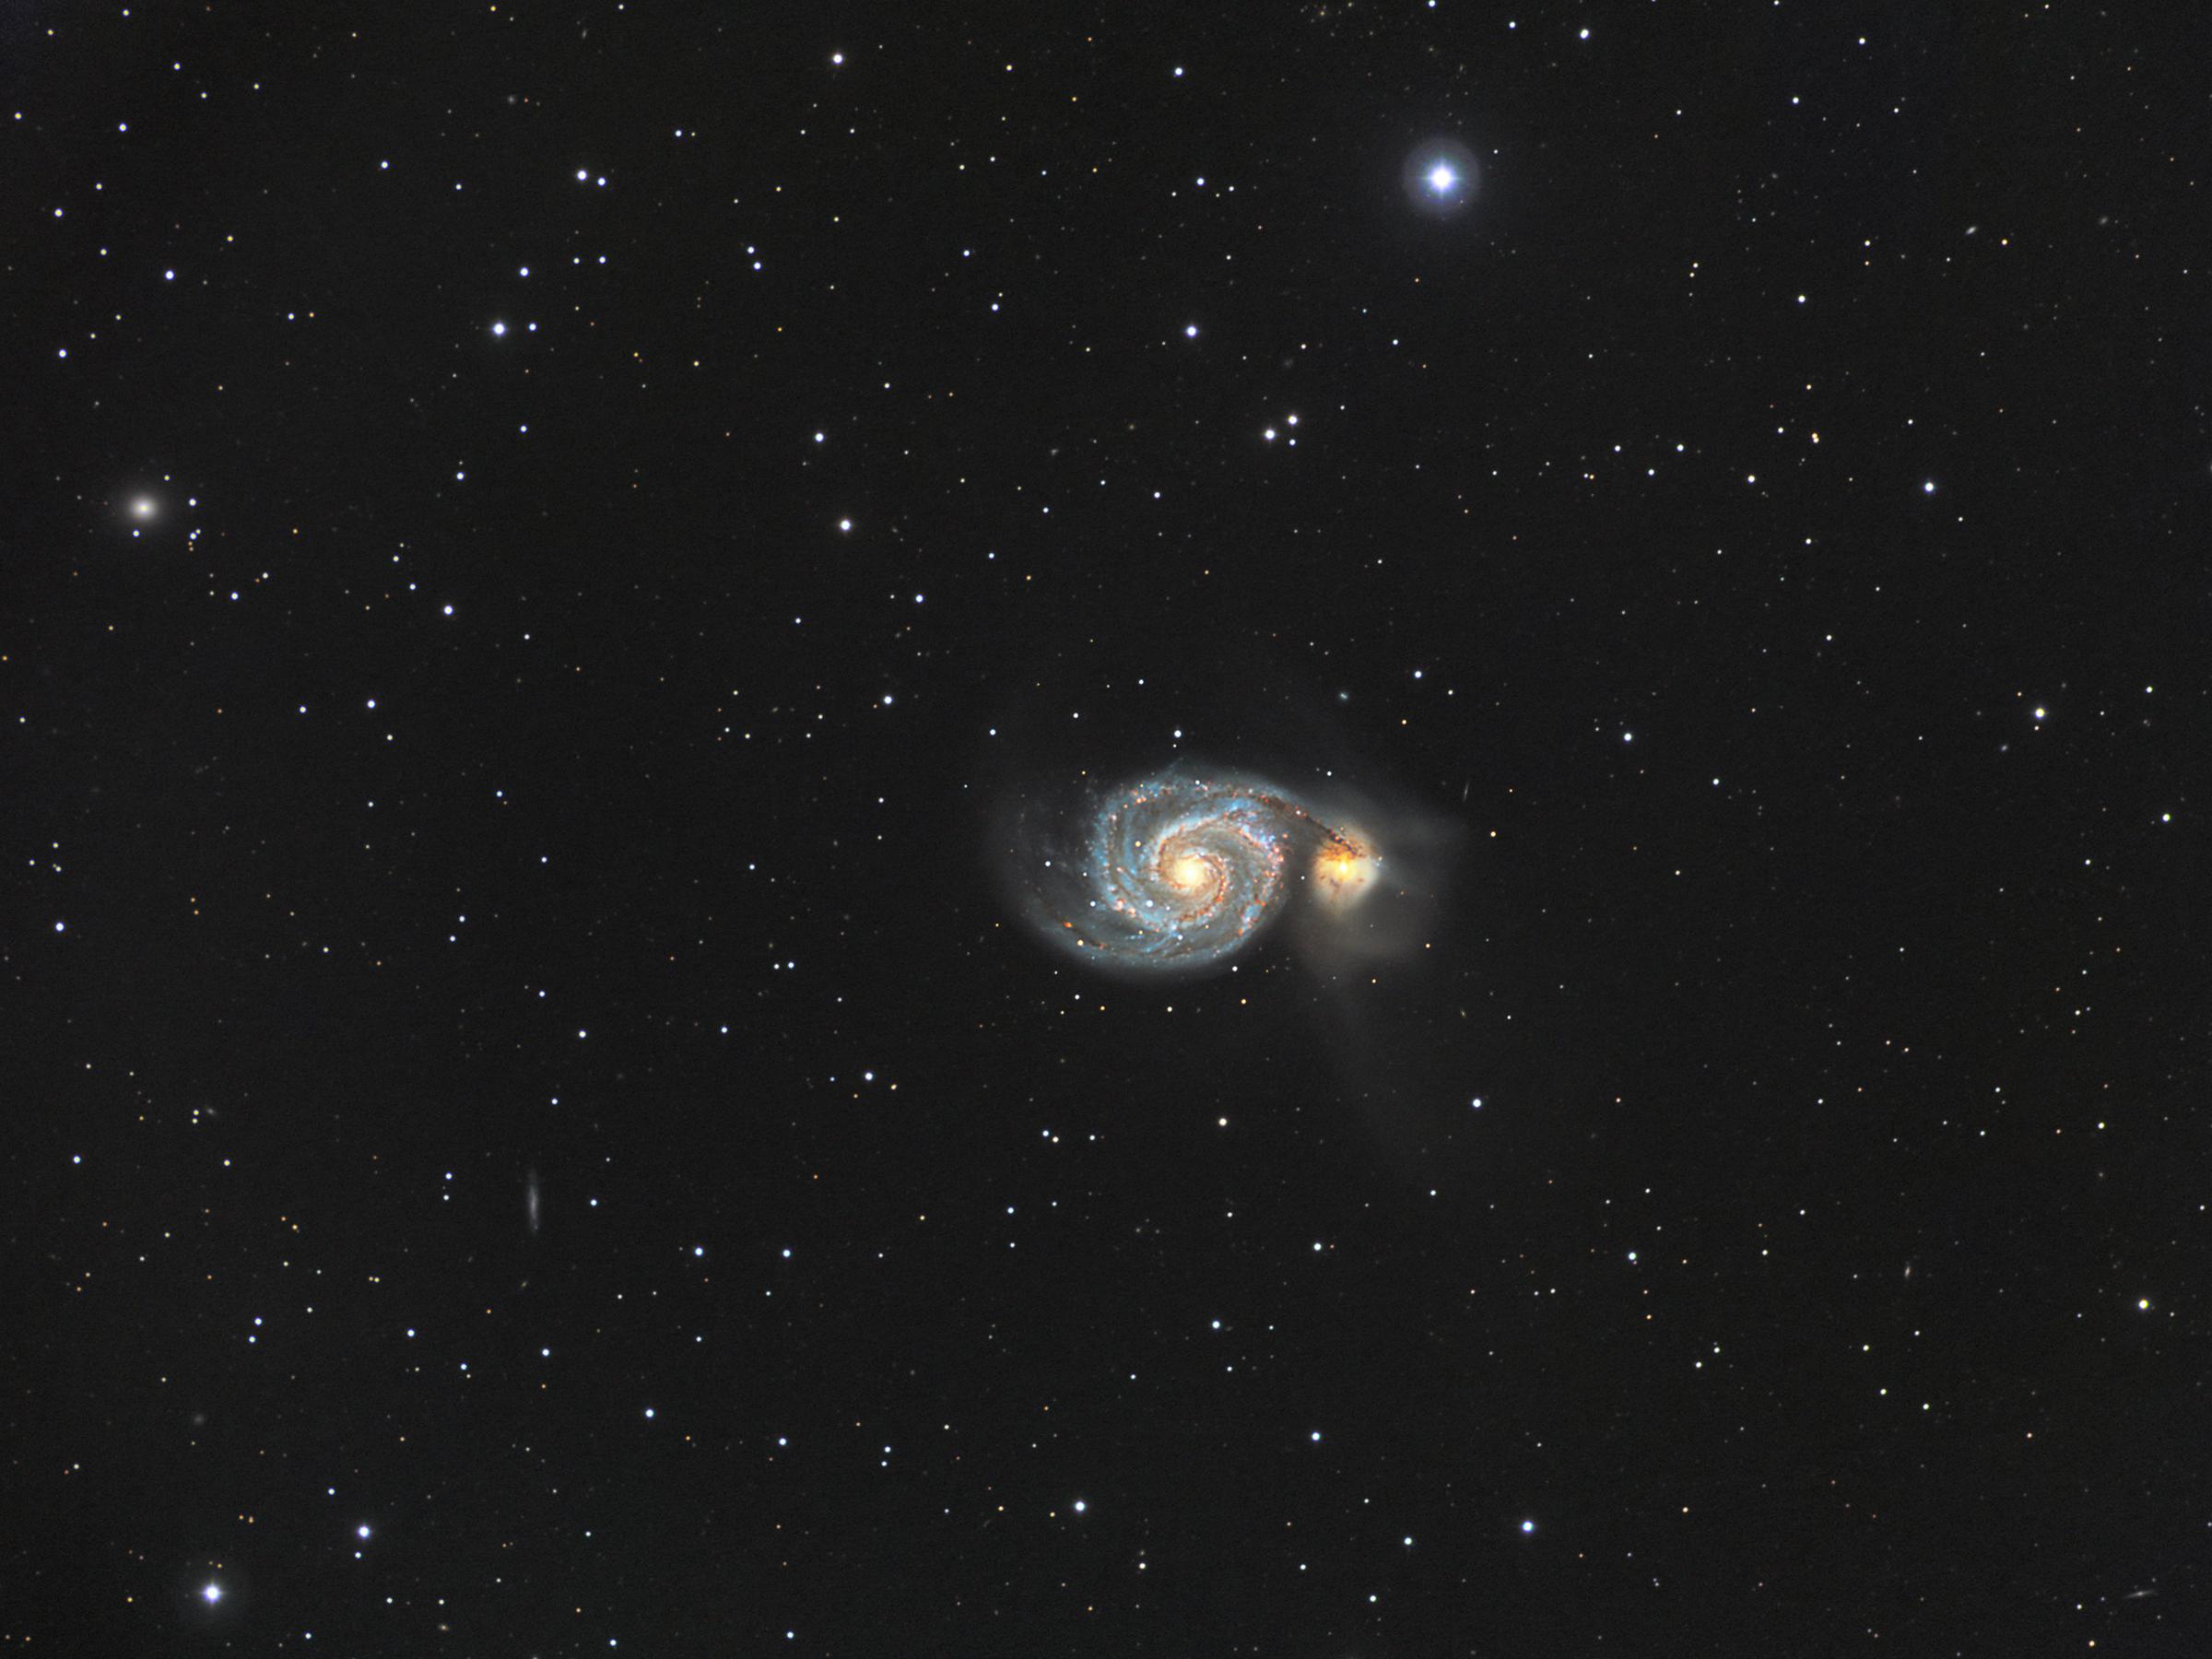 M51 Whirlpool nebula